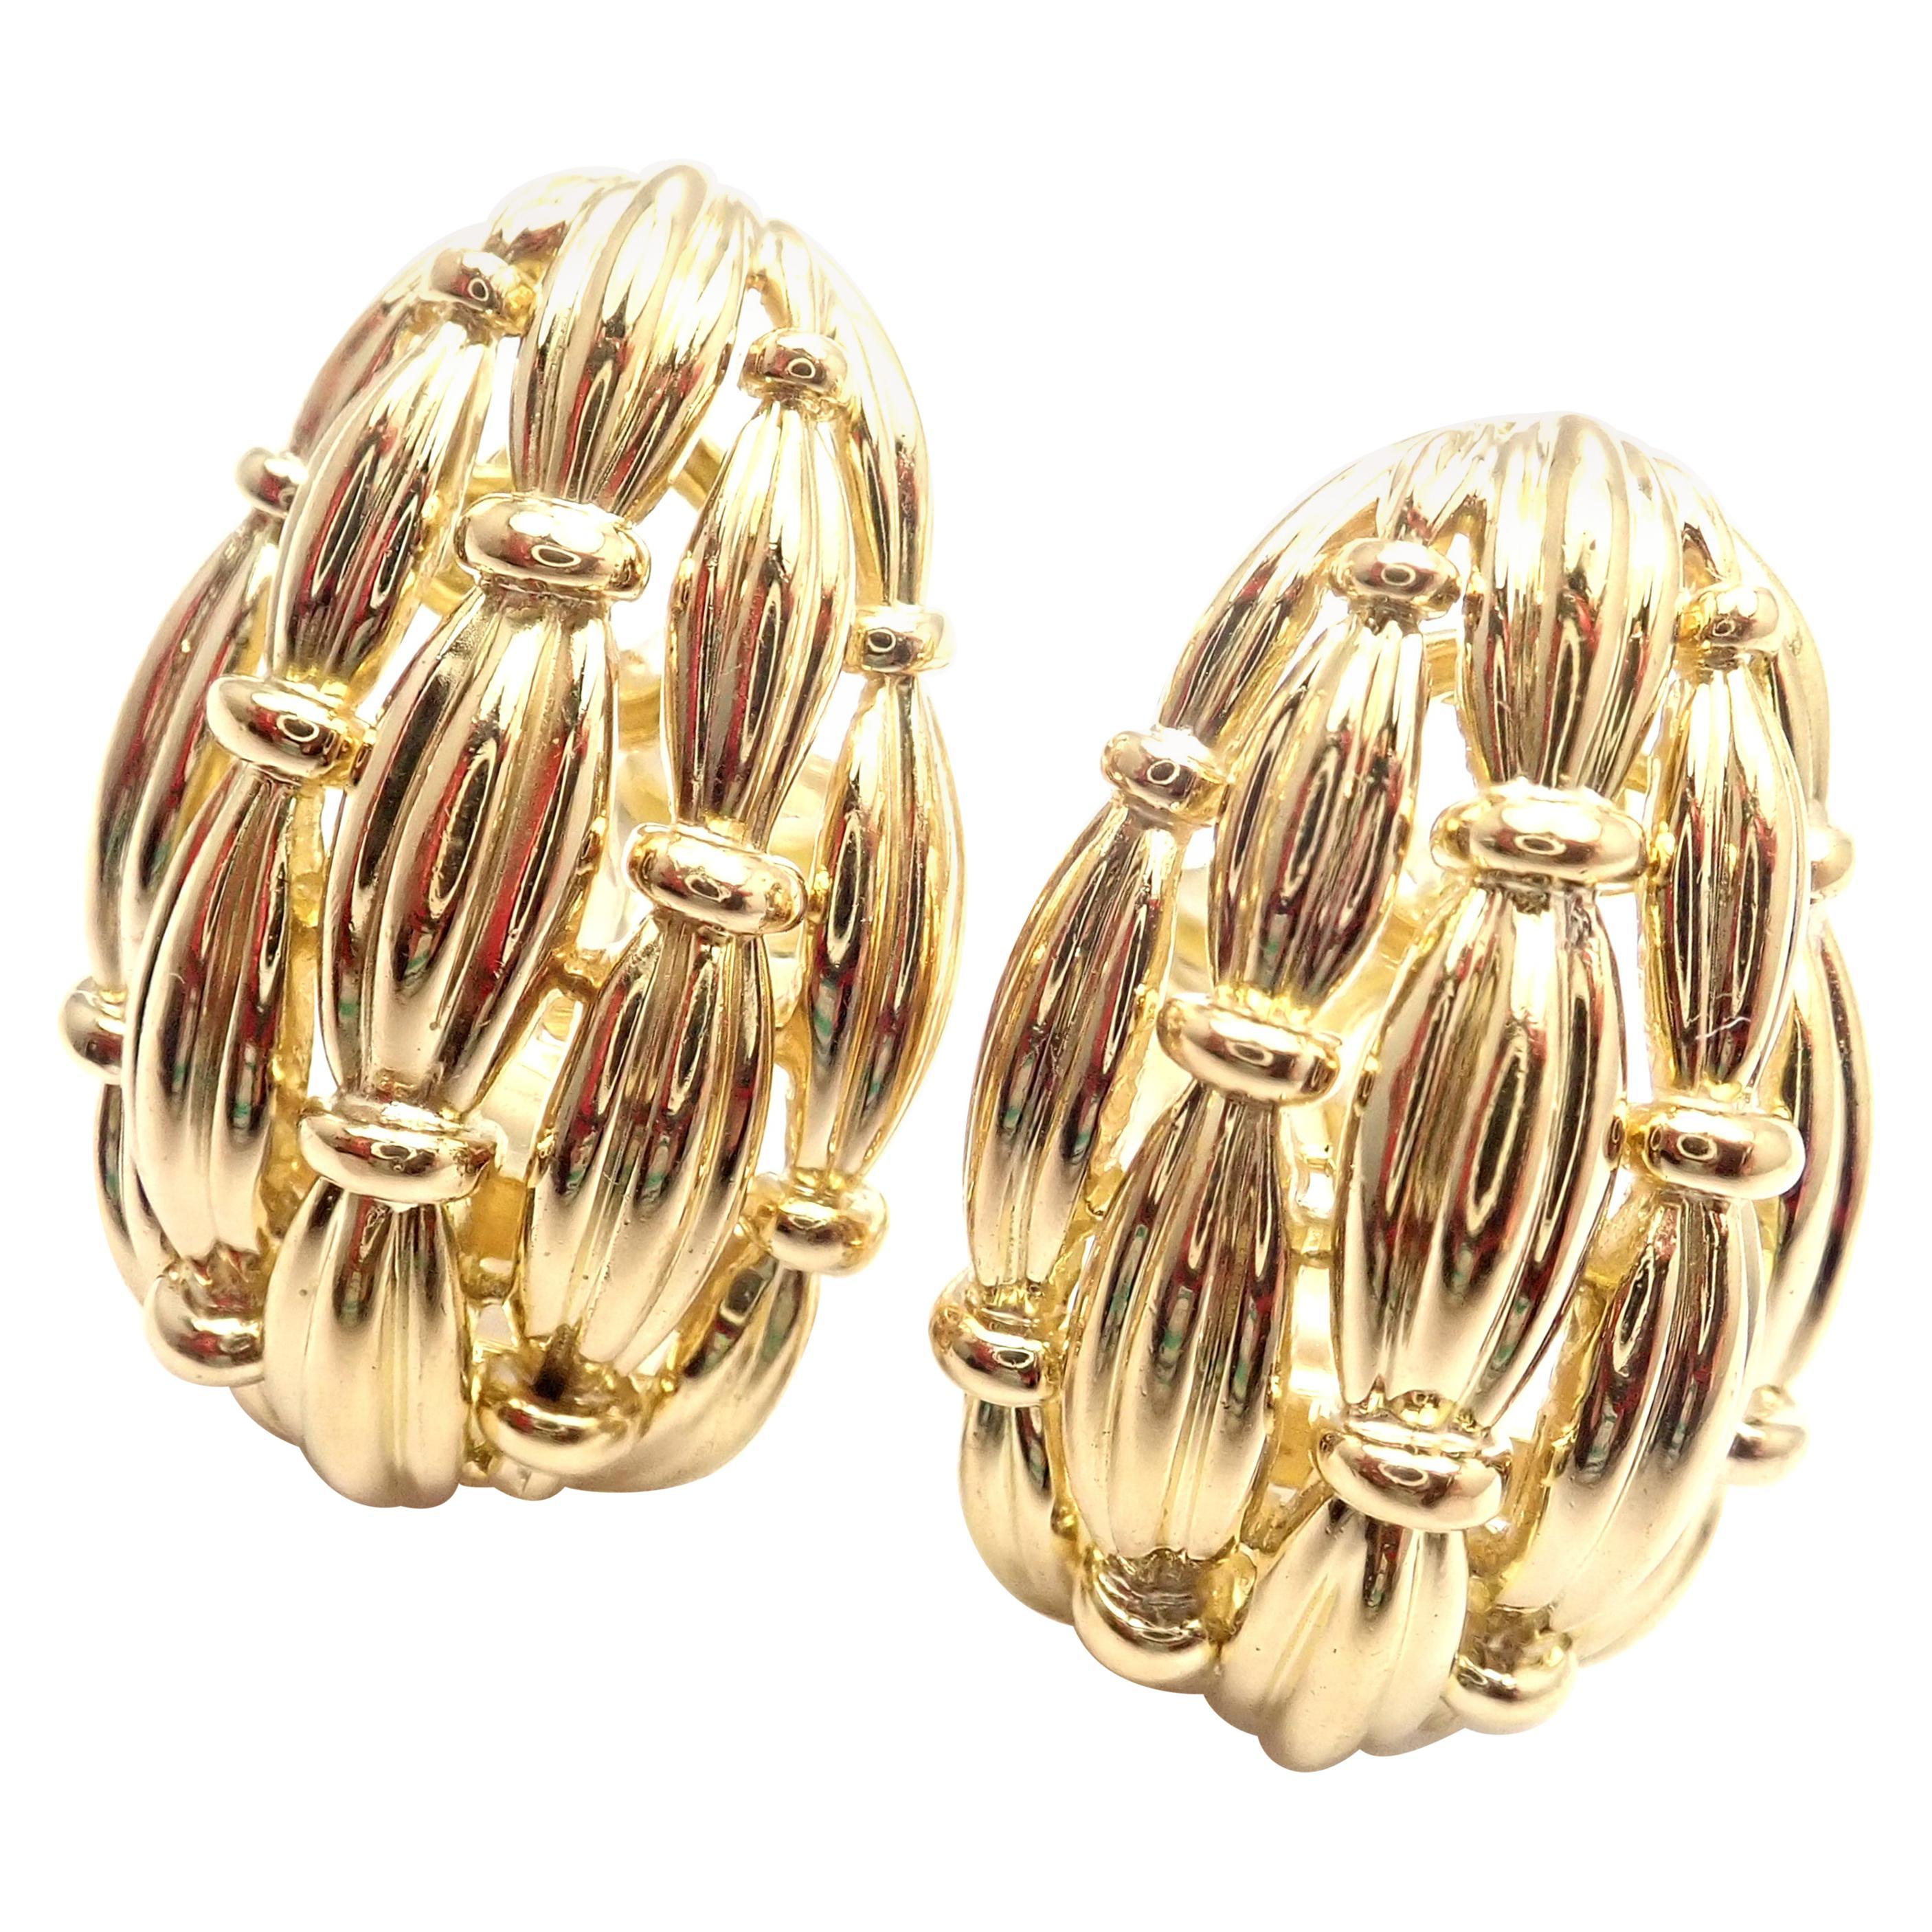 Vintage Tiffany & Co. Woven Basketweave Yellow Gold Earrings